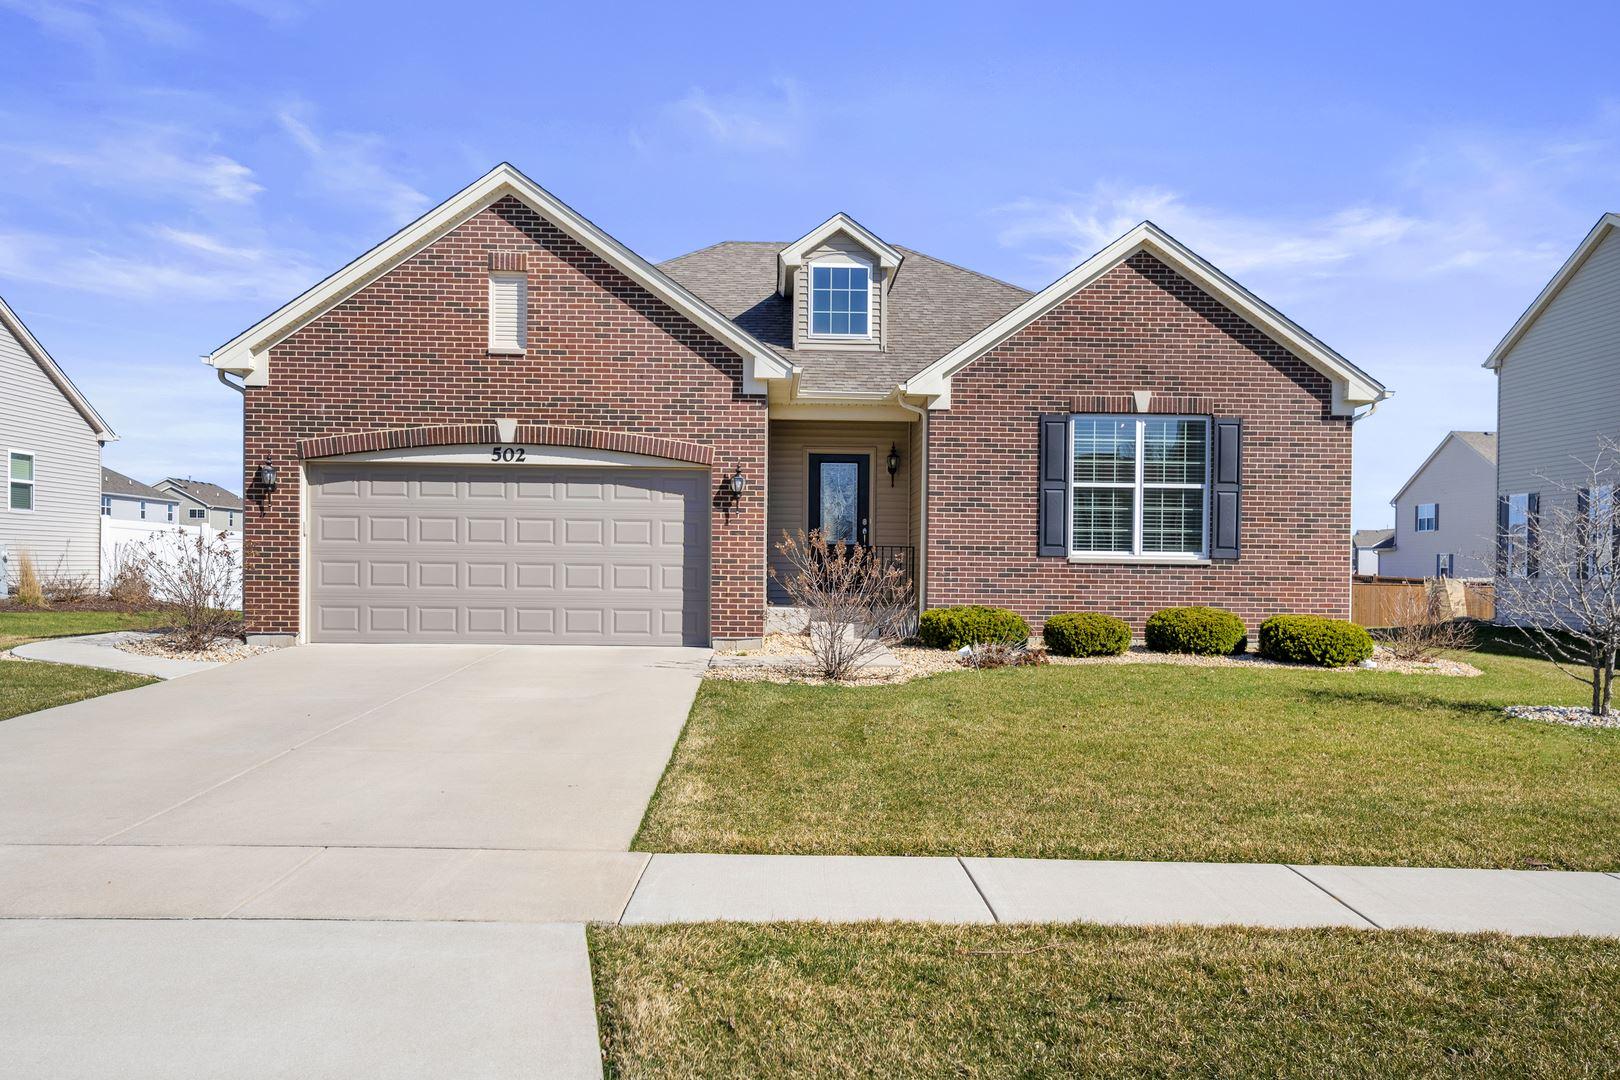 Photo of 502 Northgate Lane, Shorewood, IL 60404 (MLS # 11040236)